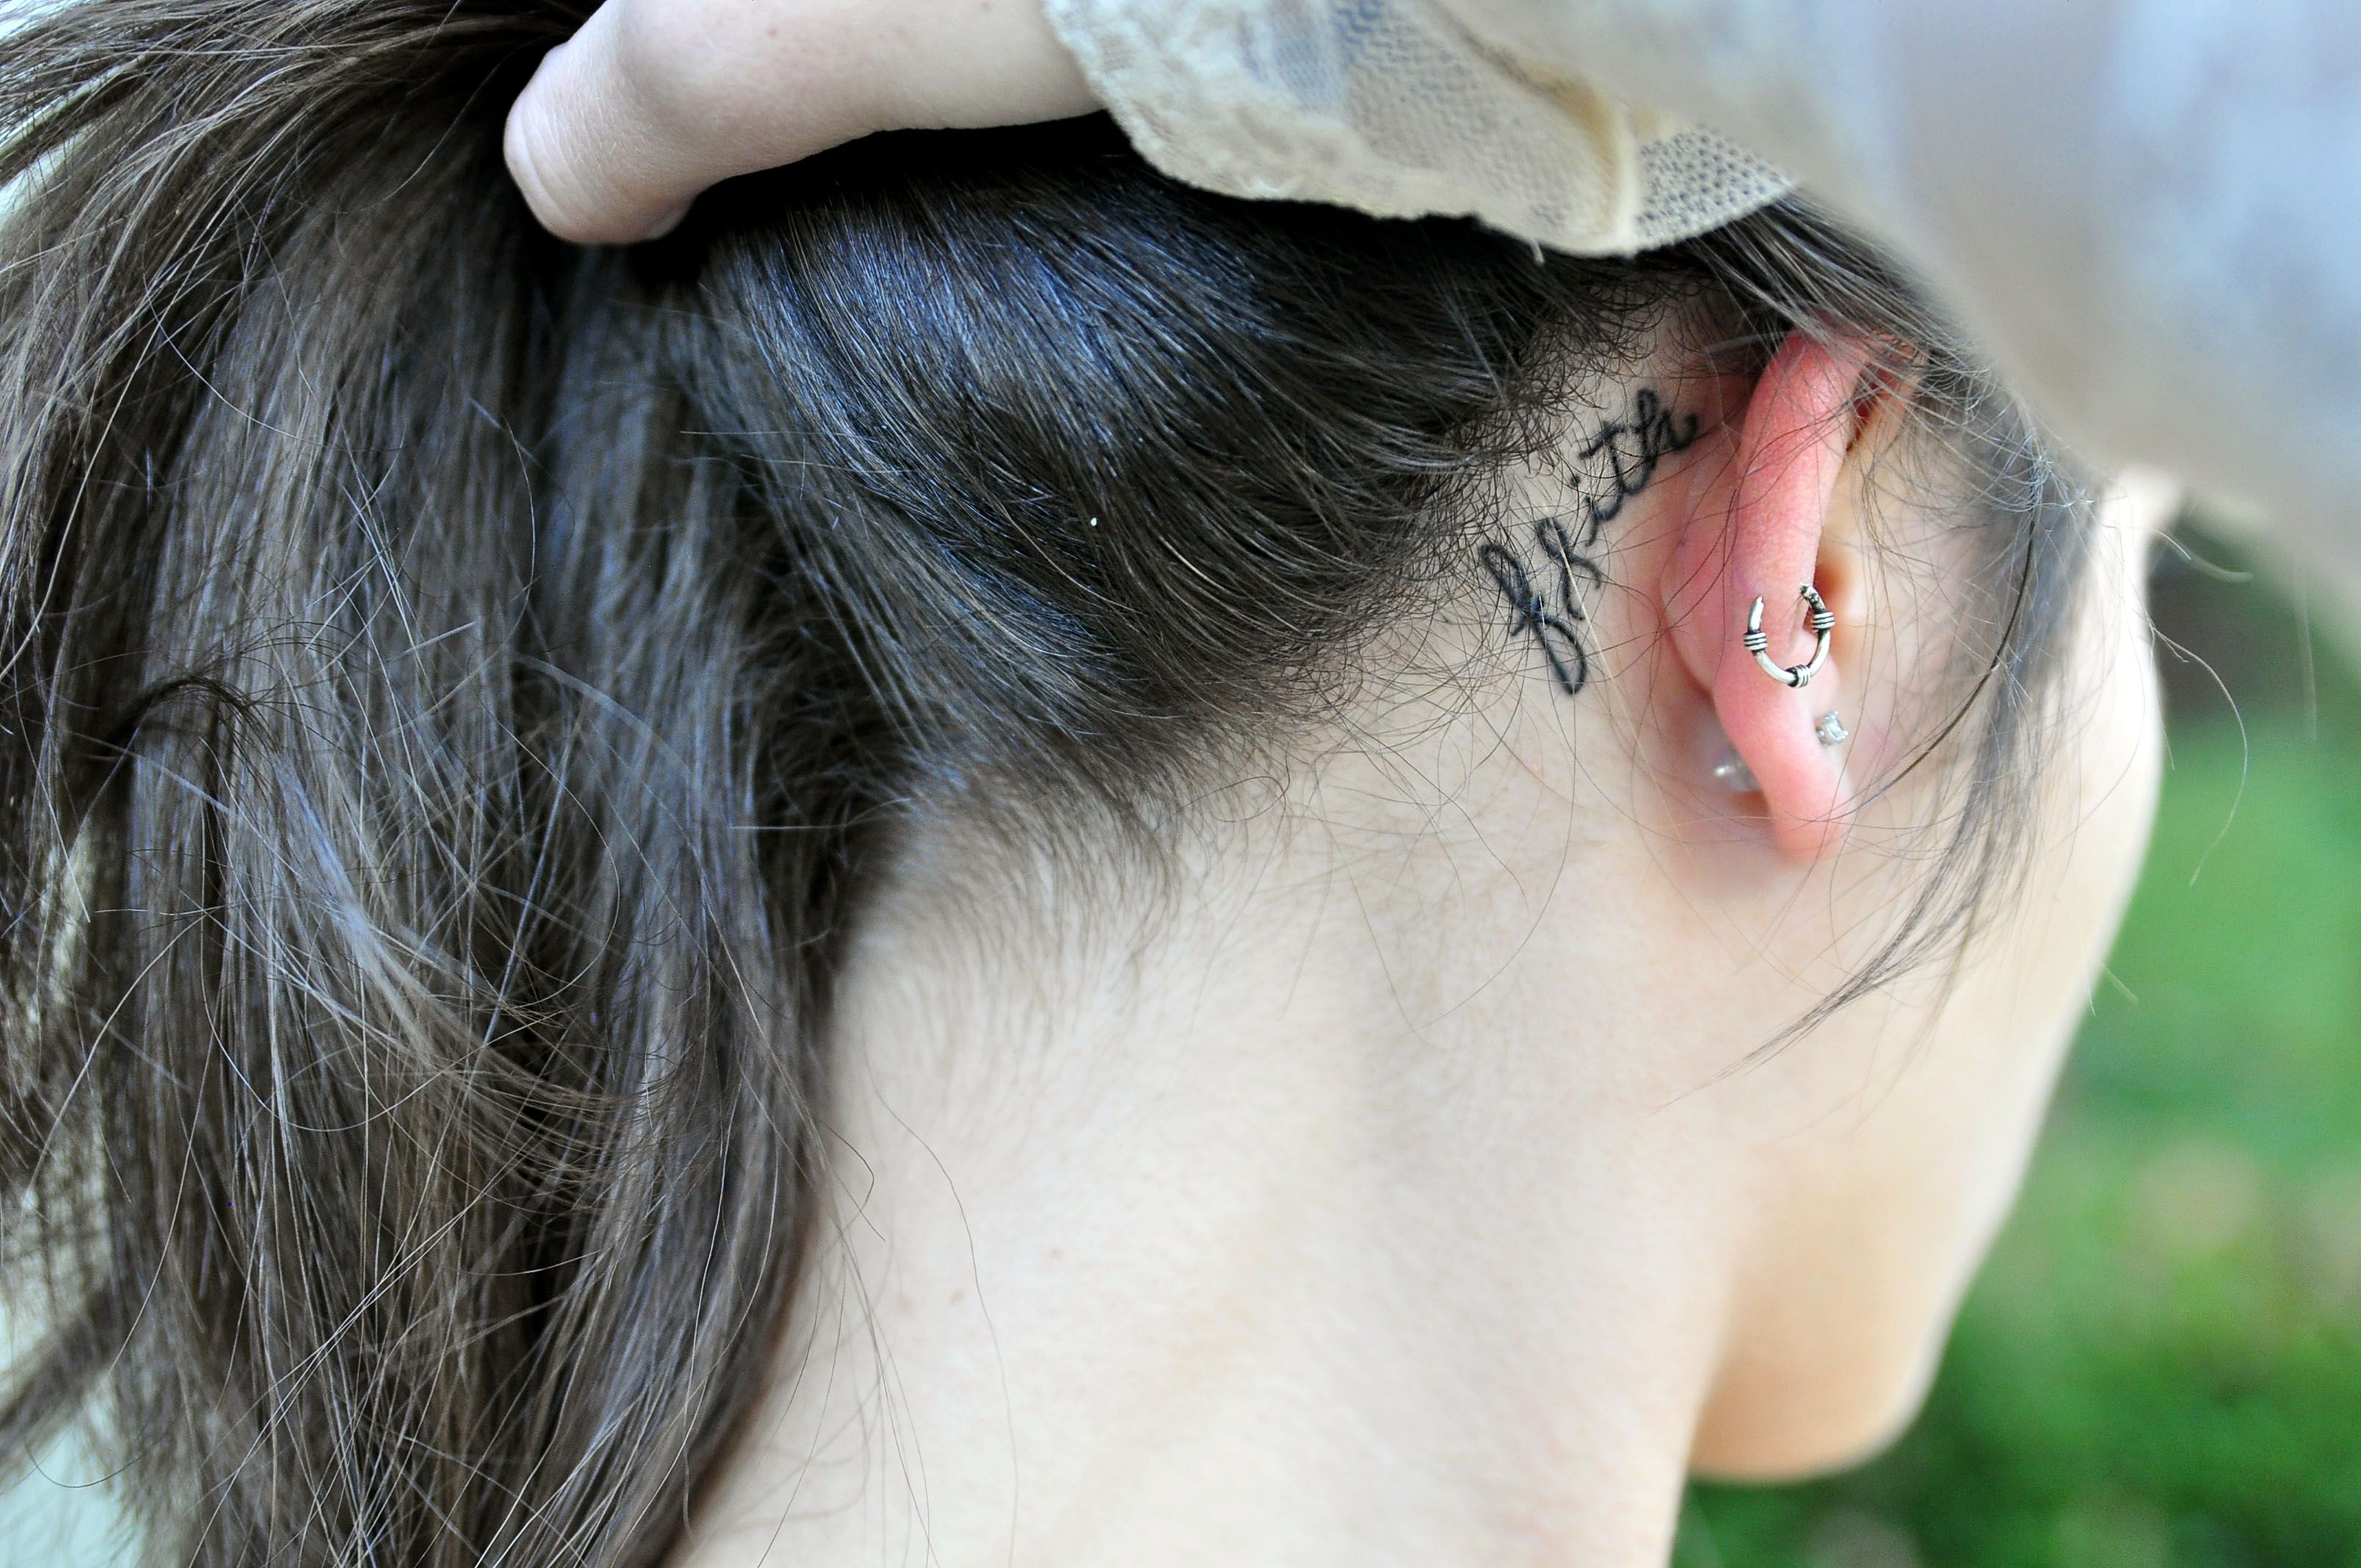 Tattoo Faith Behind The Ear Tattoo Ink Cancer Ribbon Tattoo Behind